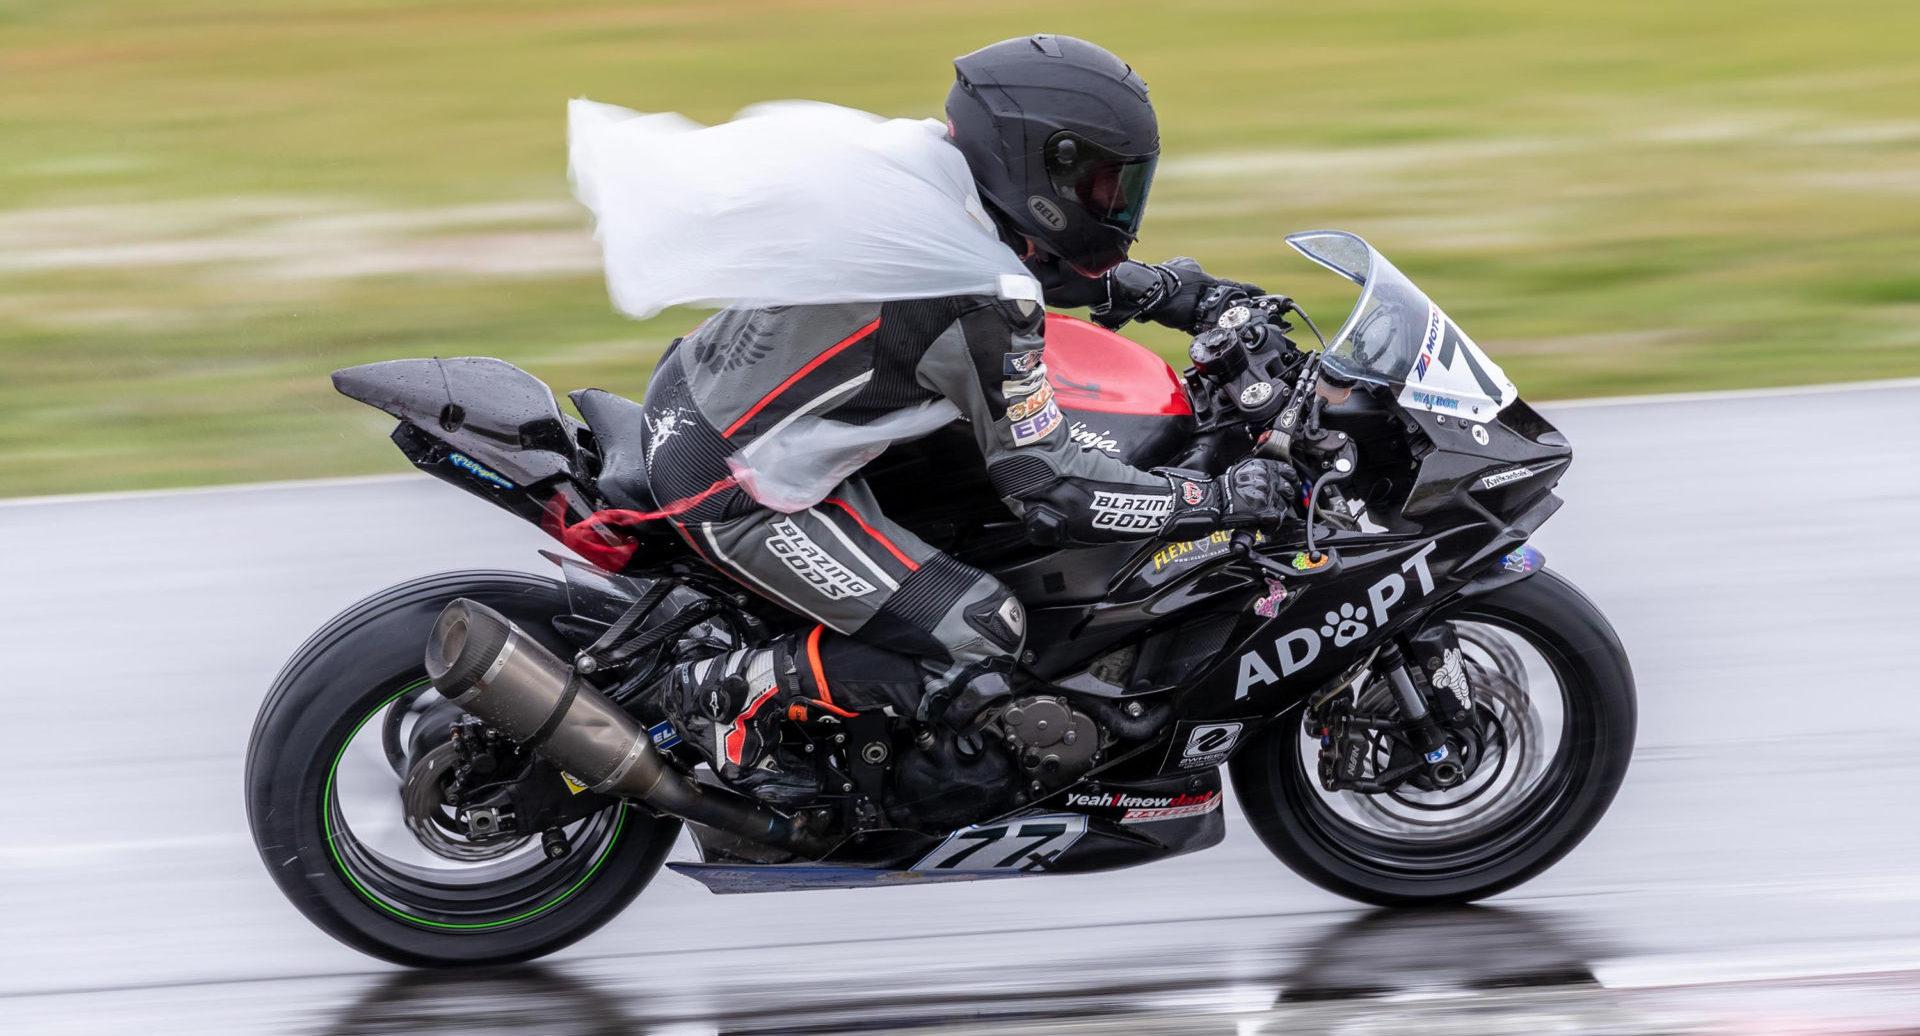 Dustin Walbon (177R) won five races on his Kawasaki ZX-6R. Photo by Minh-Tri Le/NW Focal Point Photography, courtesy OMRRA.